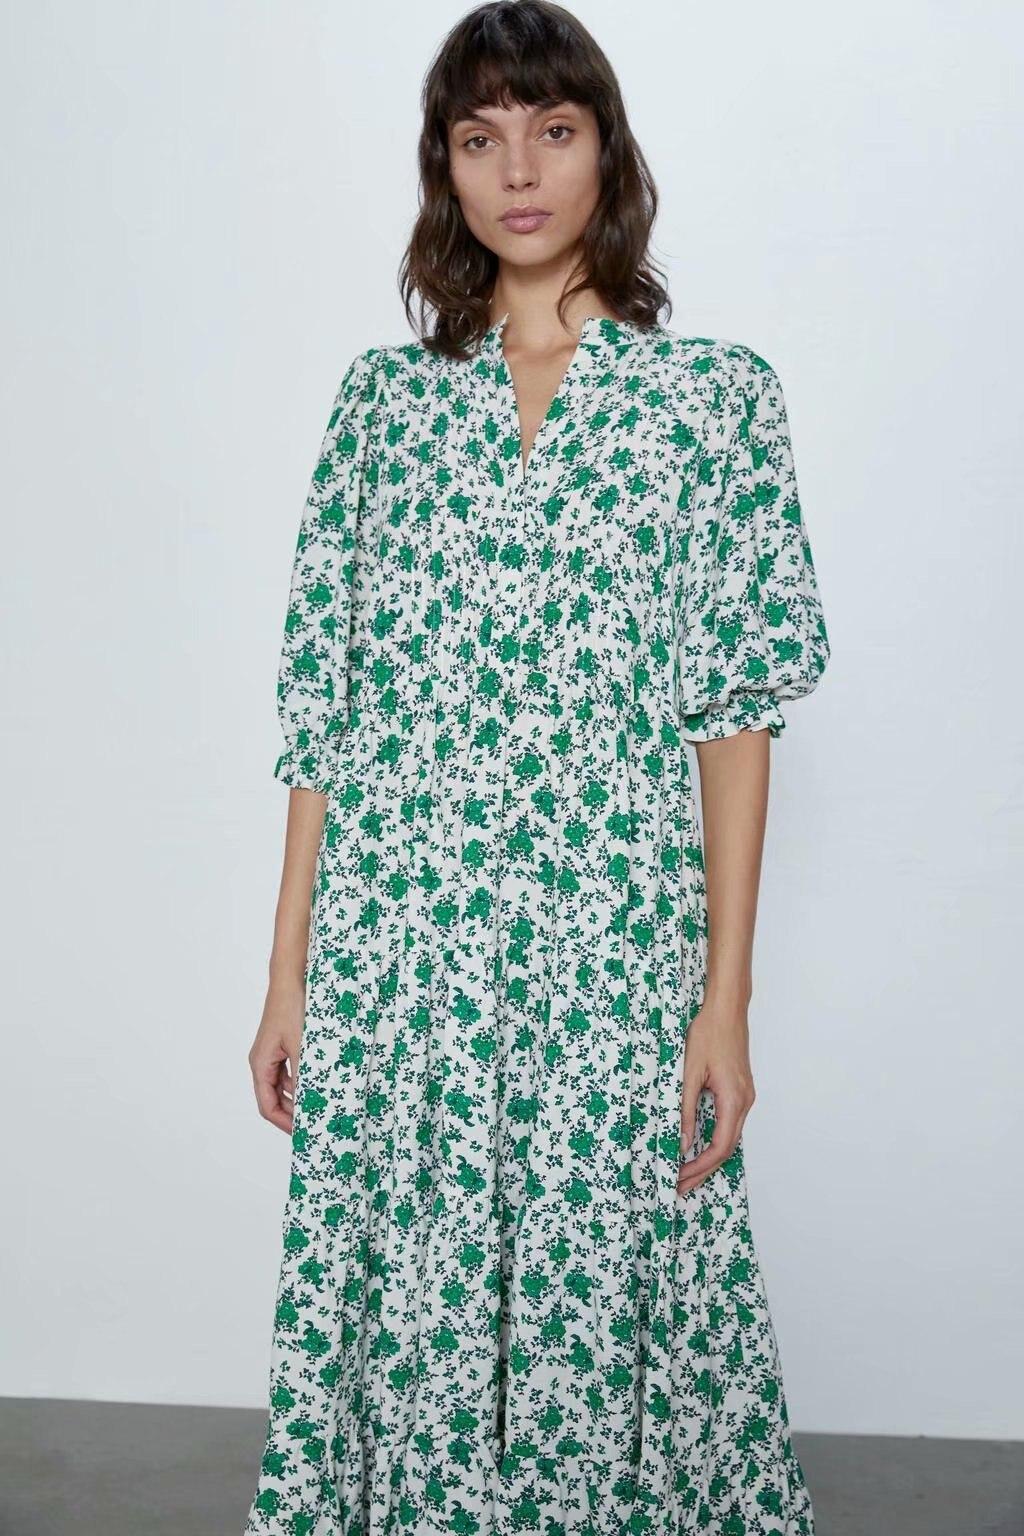 2020 New Spring Summer European Flower Floral Printed Zaraing Women Dress Vadiming Sheining Female Streetwear Dress XDN9420